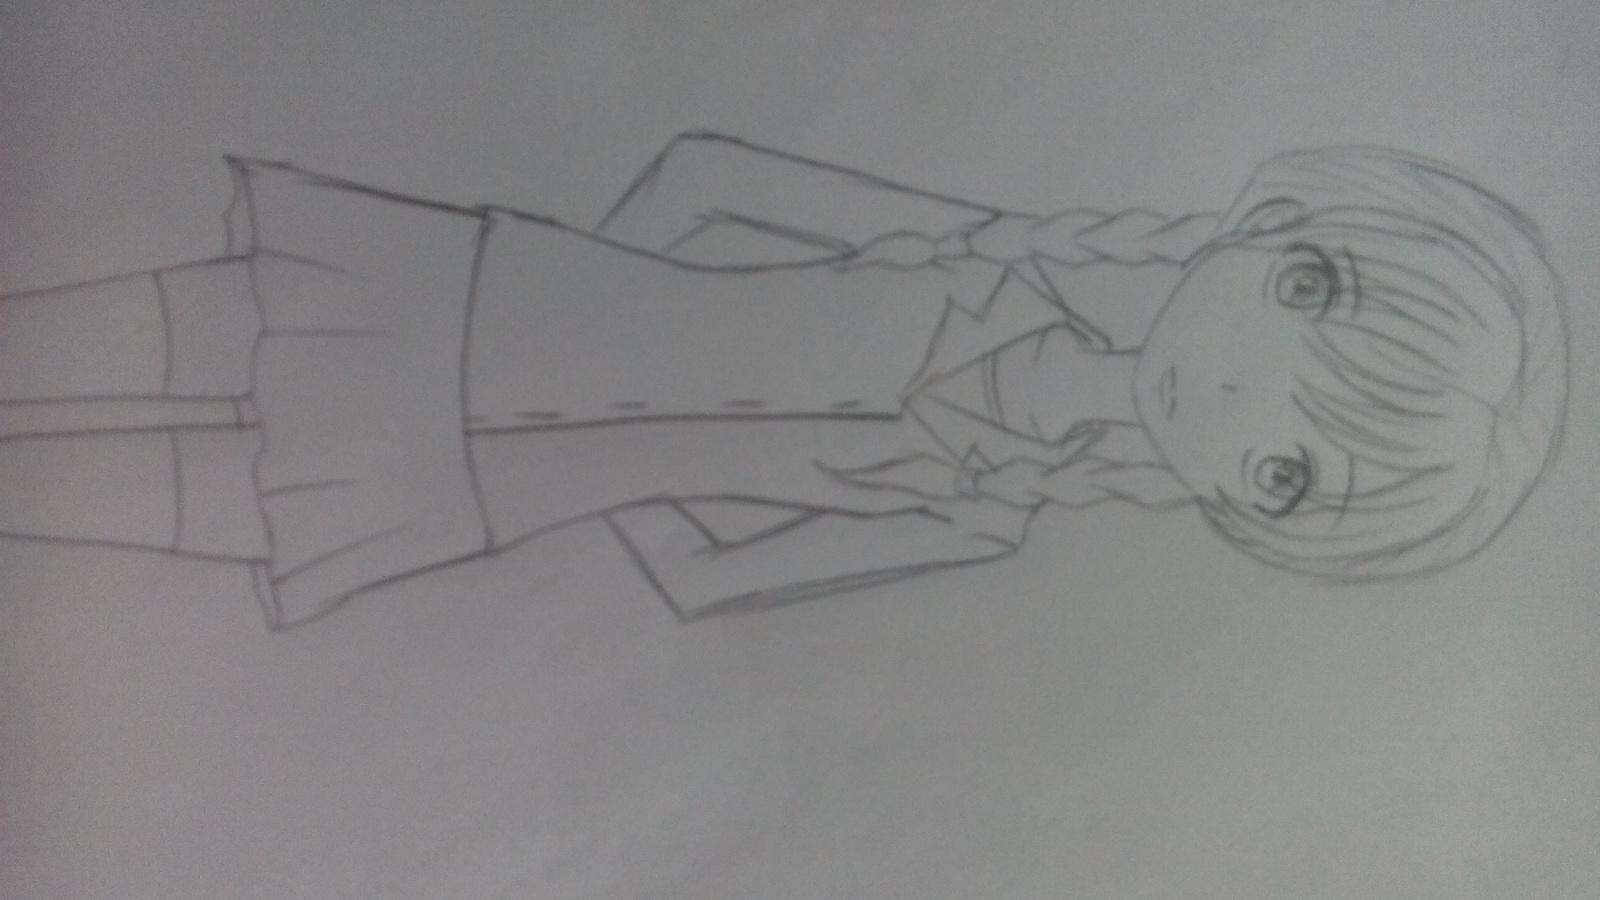 Mis Dibujos Qyy1pd